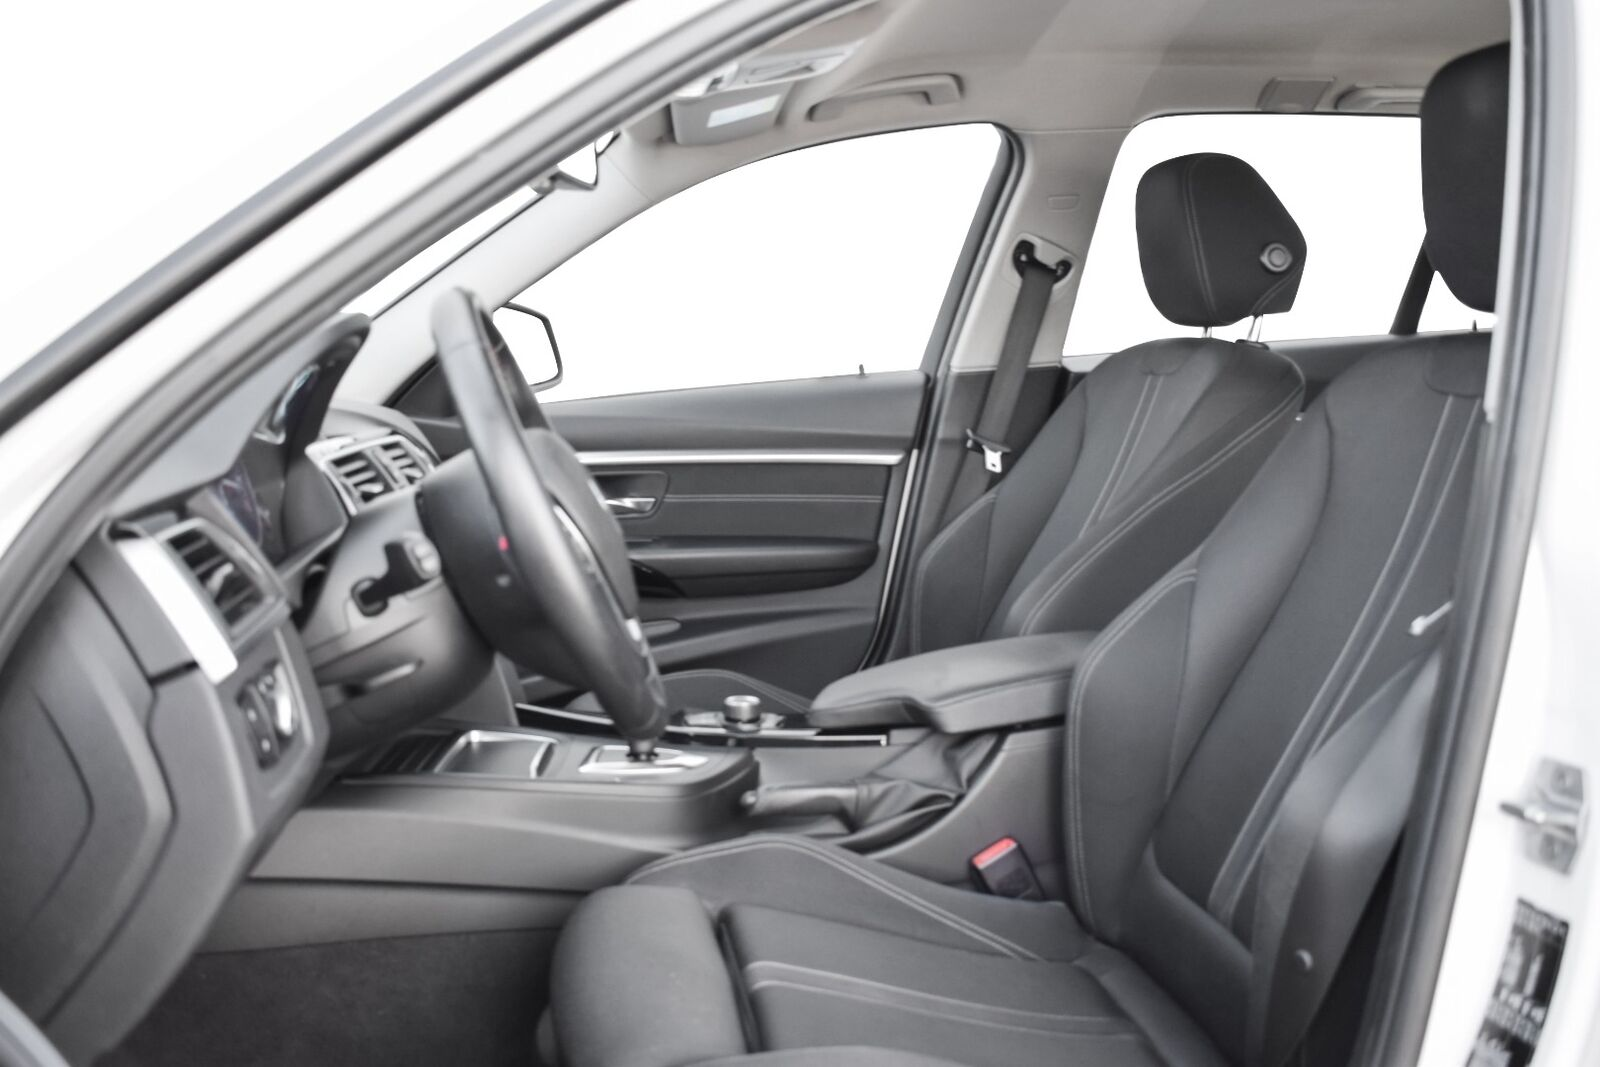 BMW 320d 2,0 Touring Sport Line xDrive aut. - billede 6